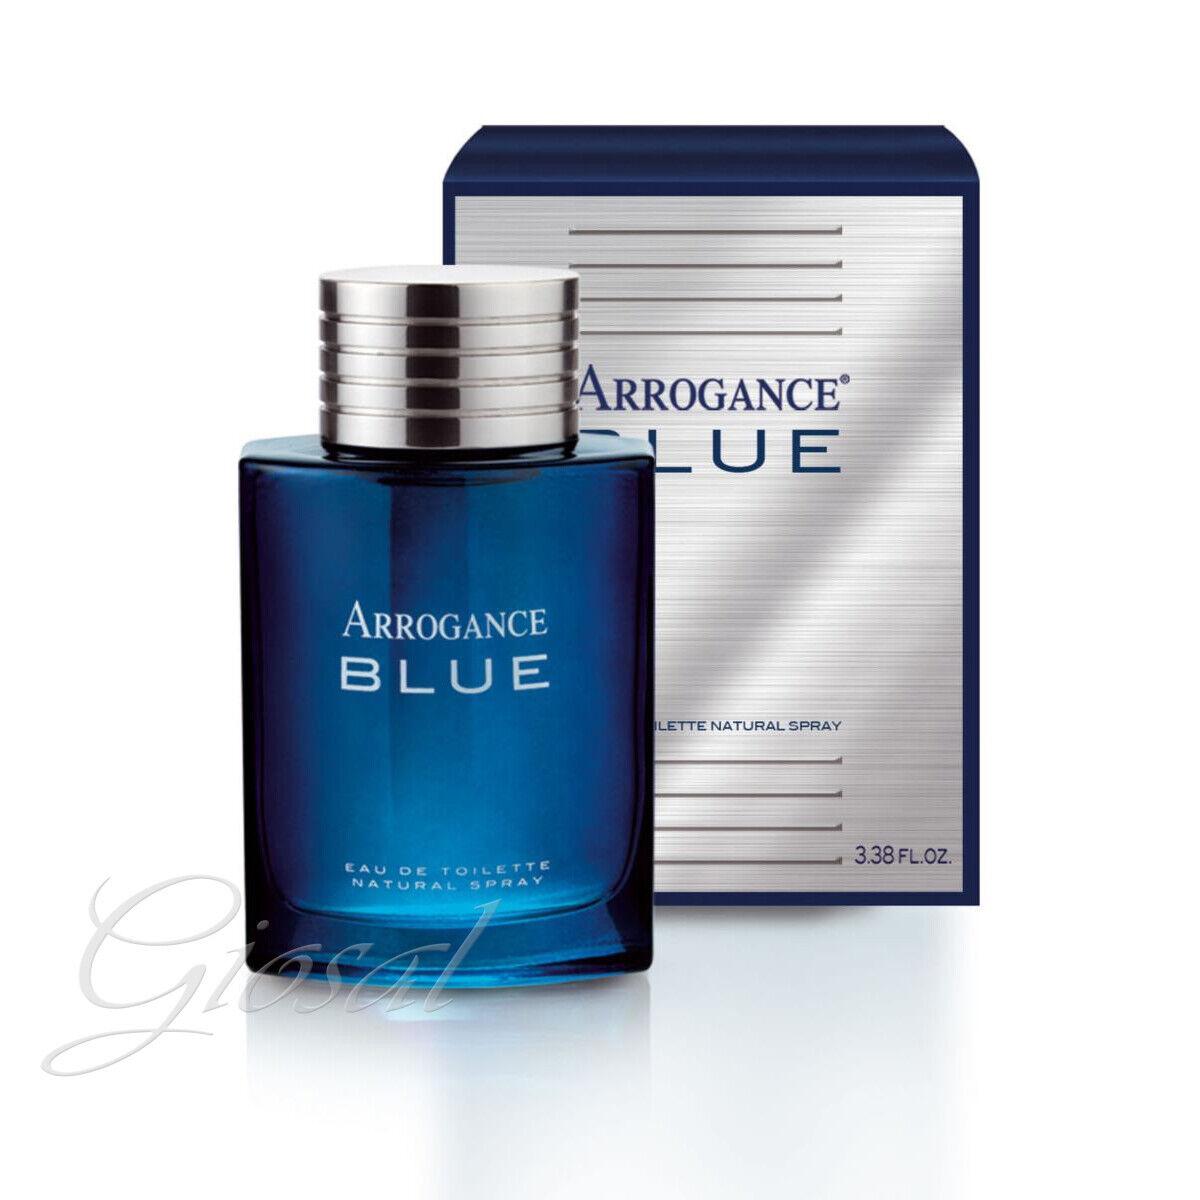 profumi: Profumo Uomo ARROGANCE Blue EDT Eau De Toilette 30ML 50ML 100ML SPRAYGIOSAL